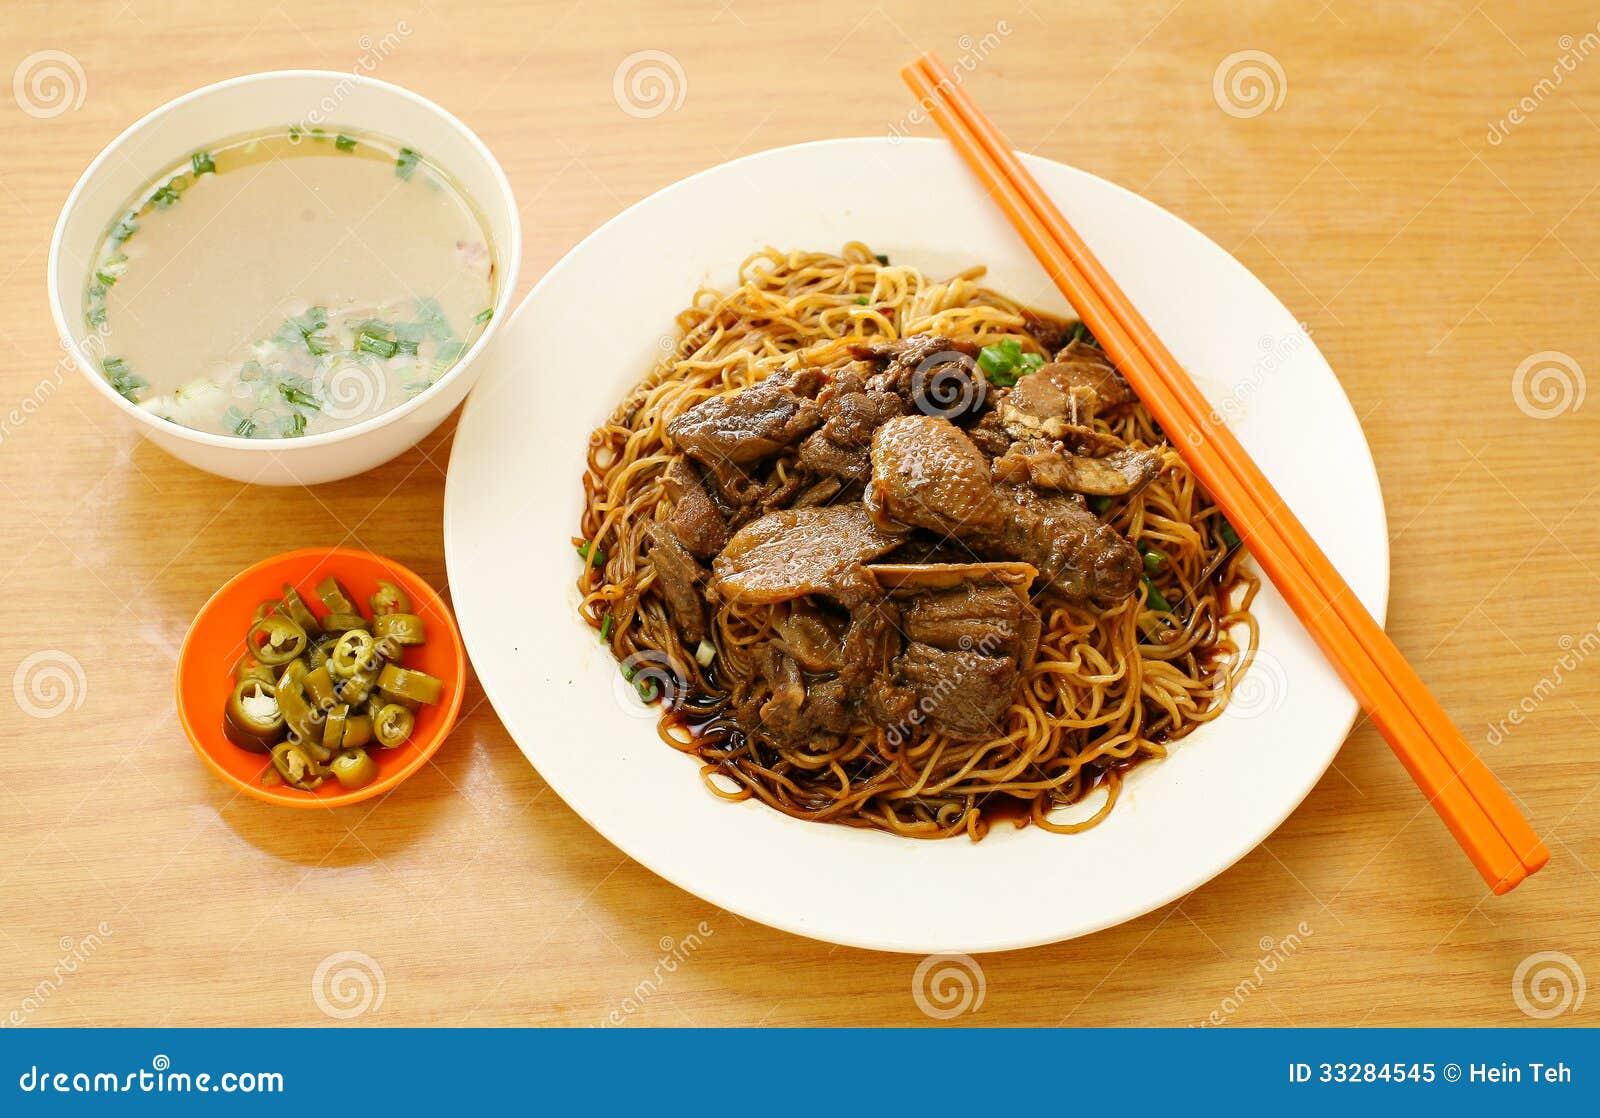 Duck noodle. food asia